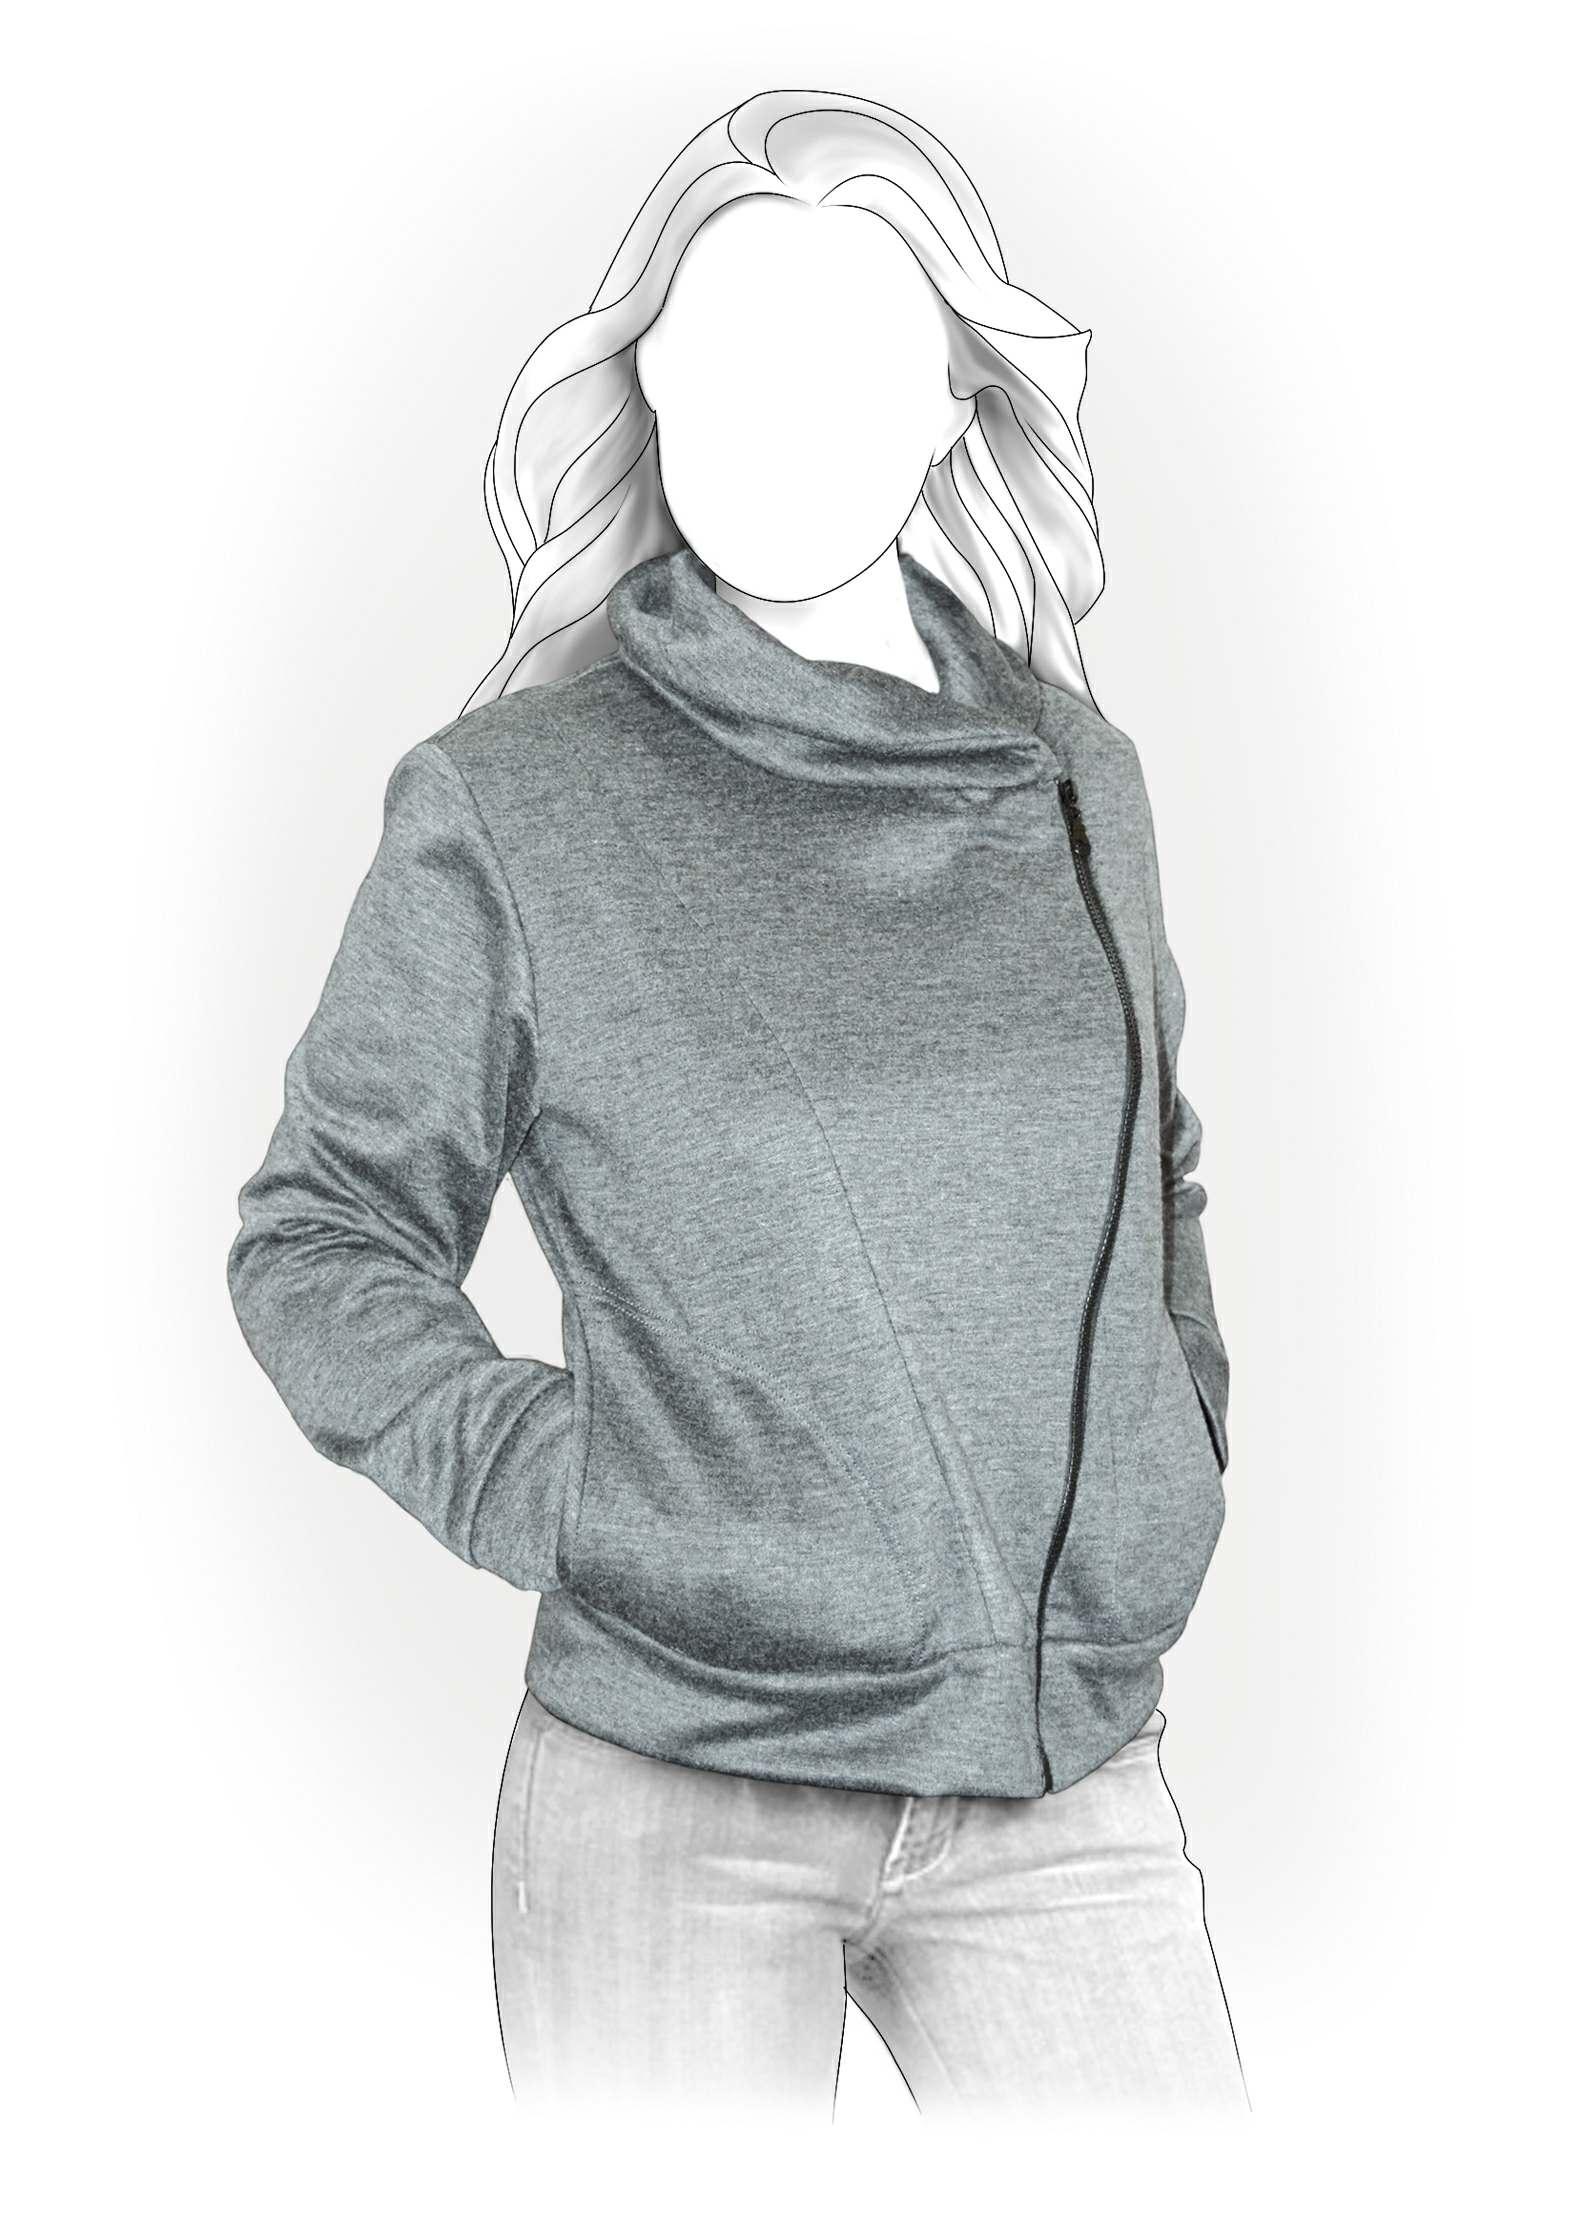 Sweatshirt Sewing Pattern 4011 Made To Measure Sewing